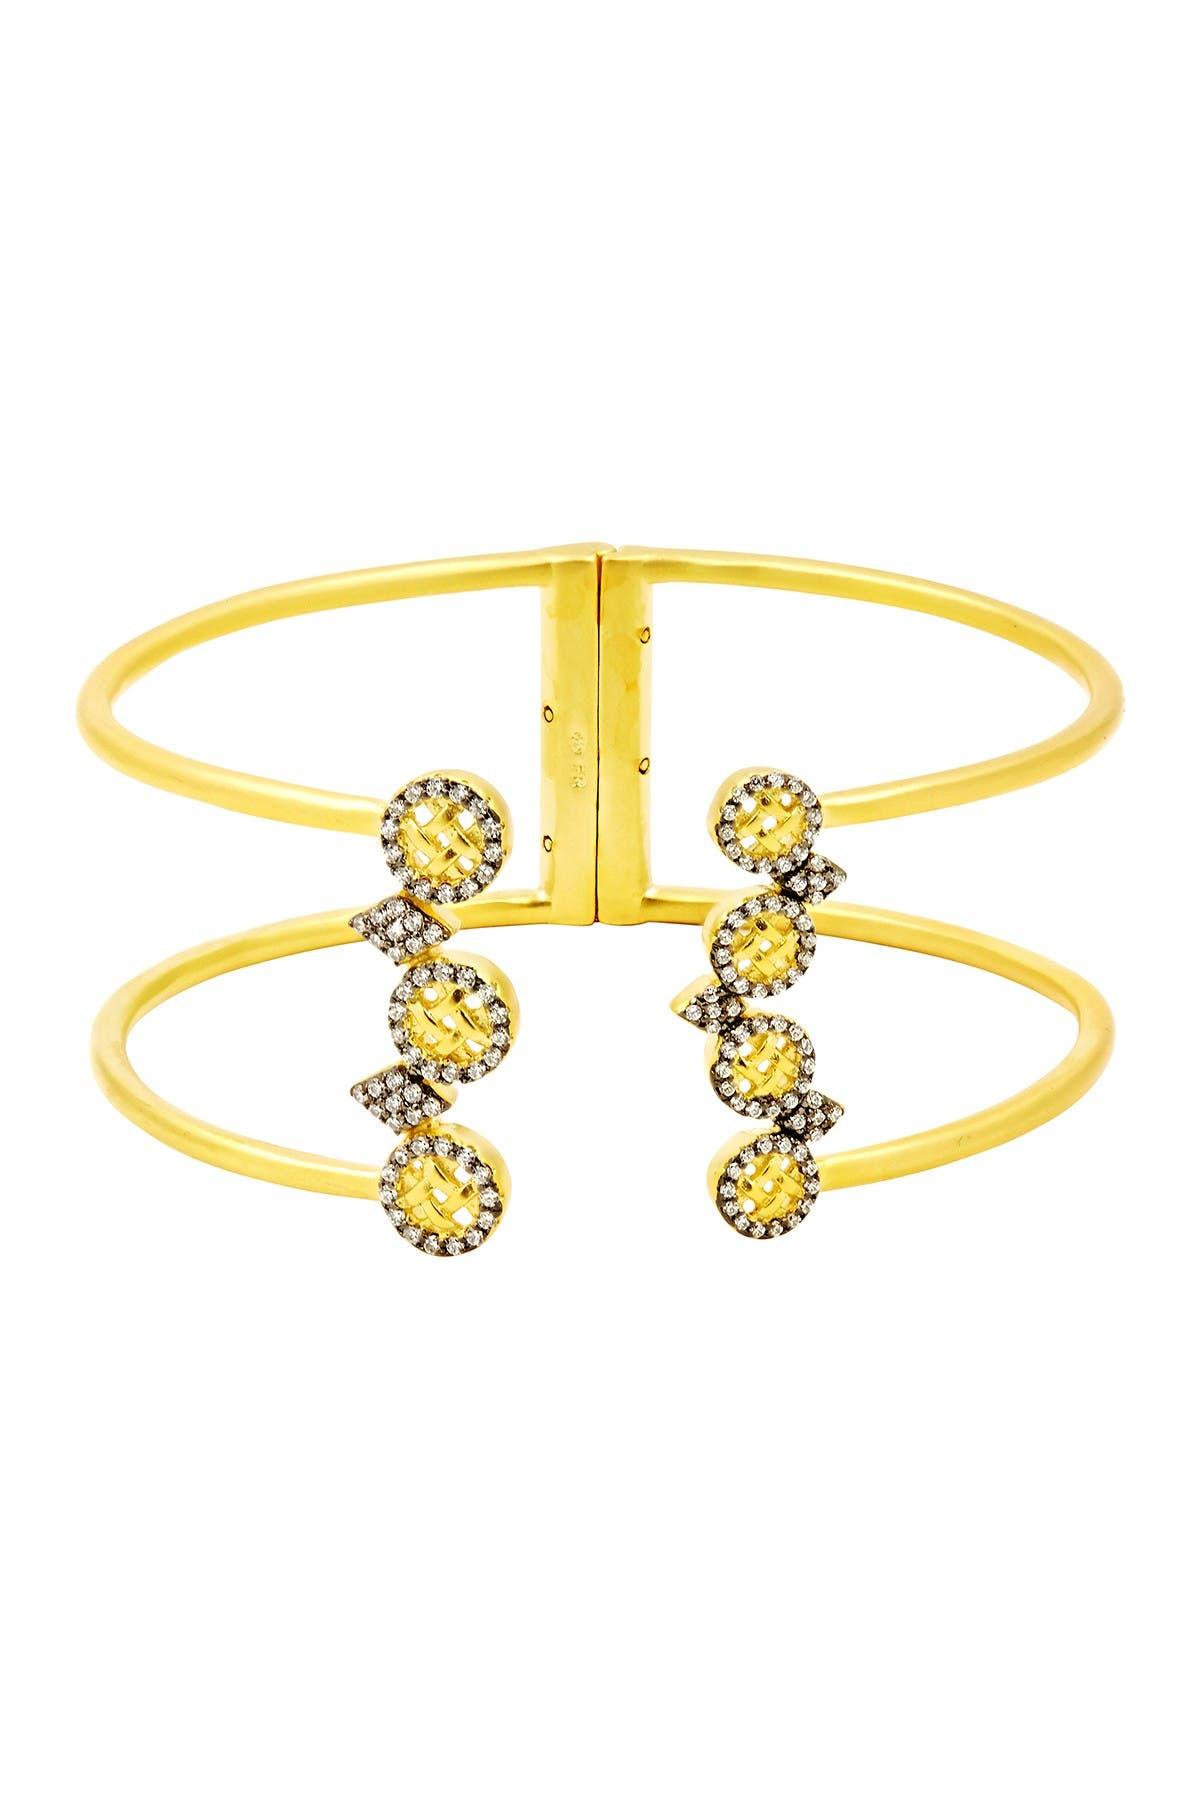 Image of Freida Rothman 14K Yellow Gold Plated Sterling Silver CZ Lattice Motif Cuff Bracelet